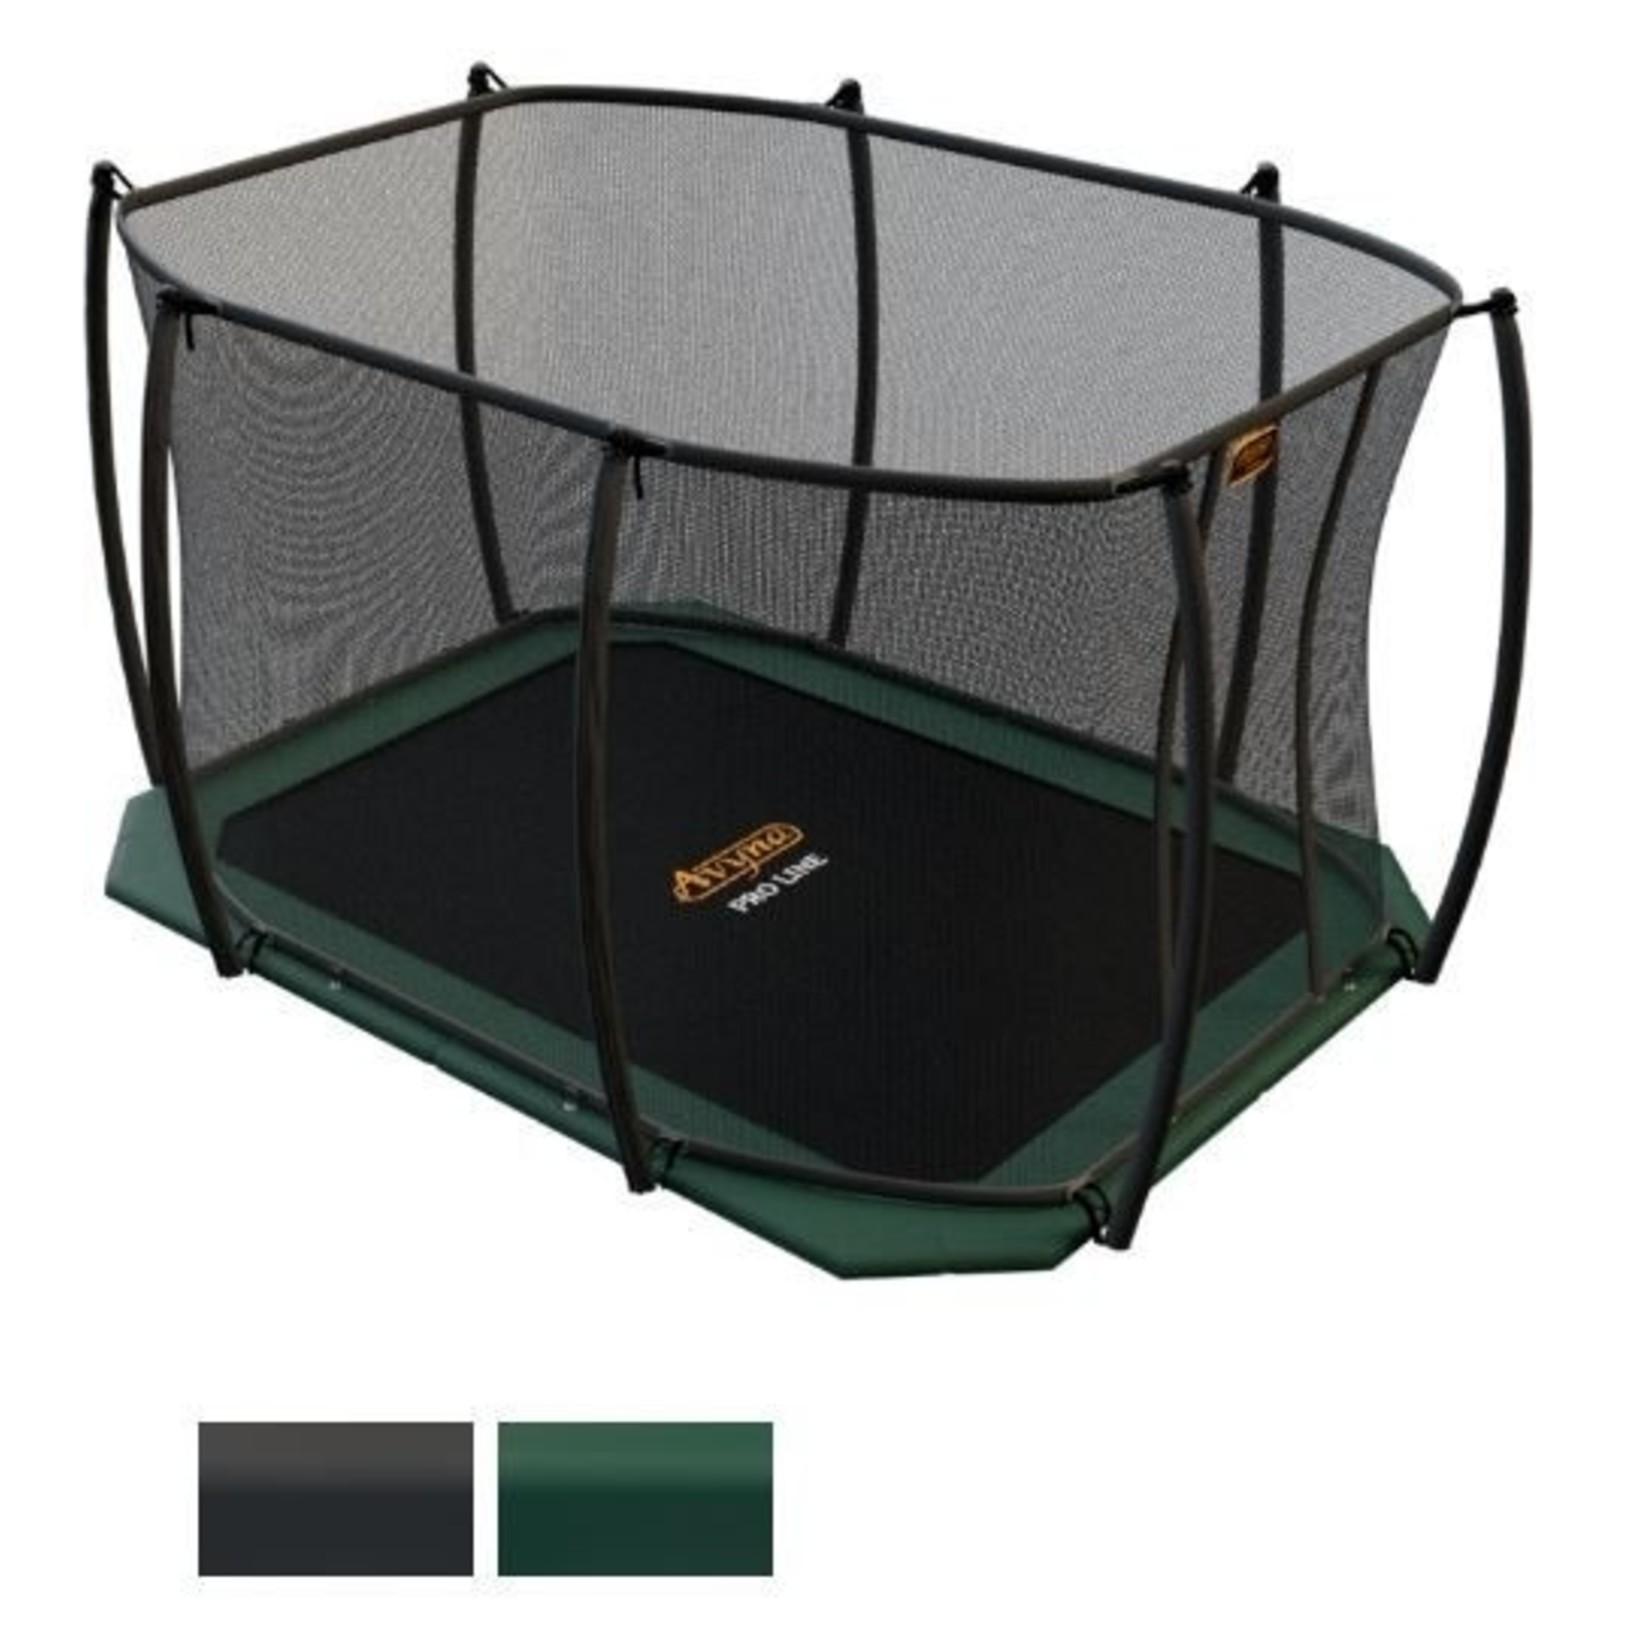 Rechthoekige trampoline   Avyna Pro-Line FlatLevel 315x225 cm